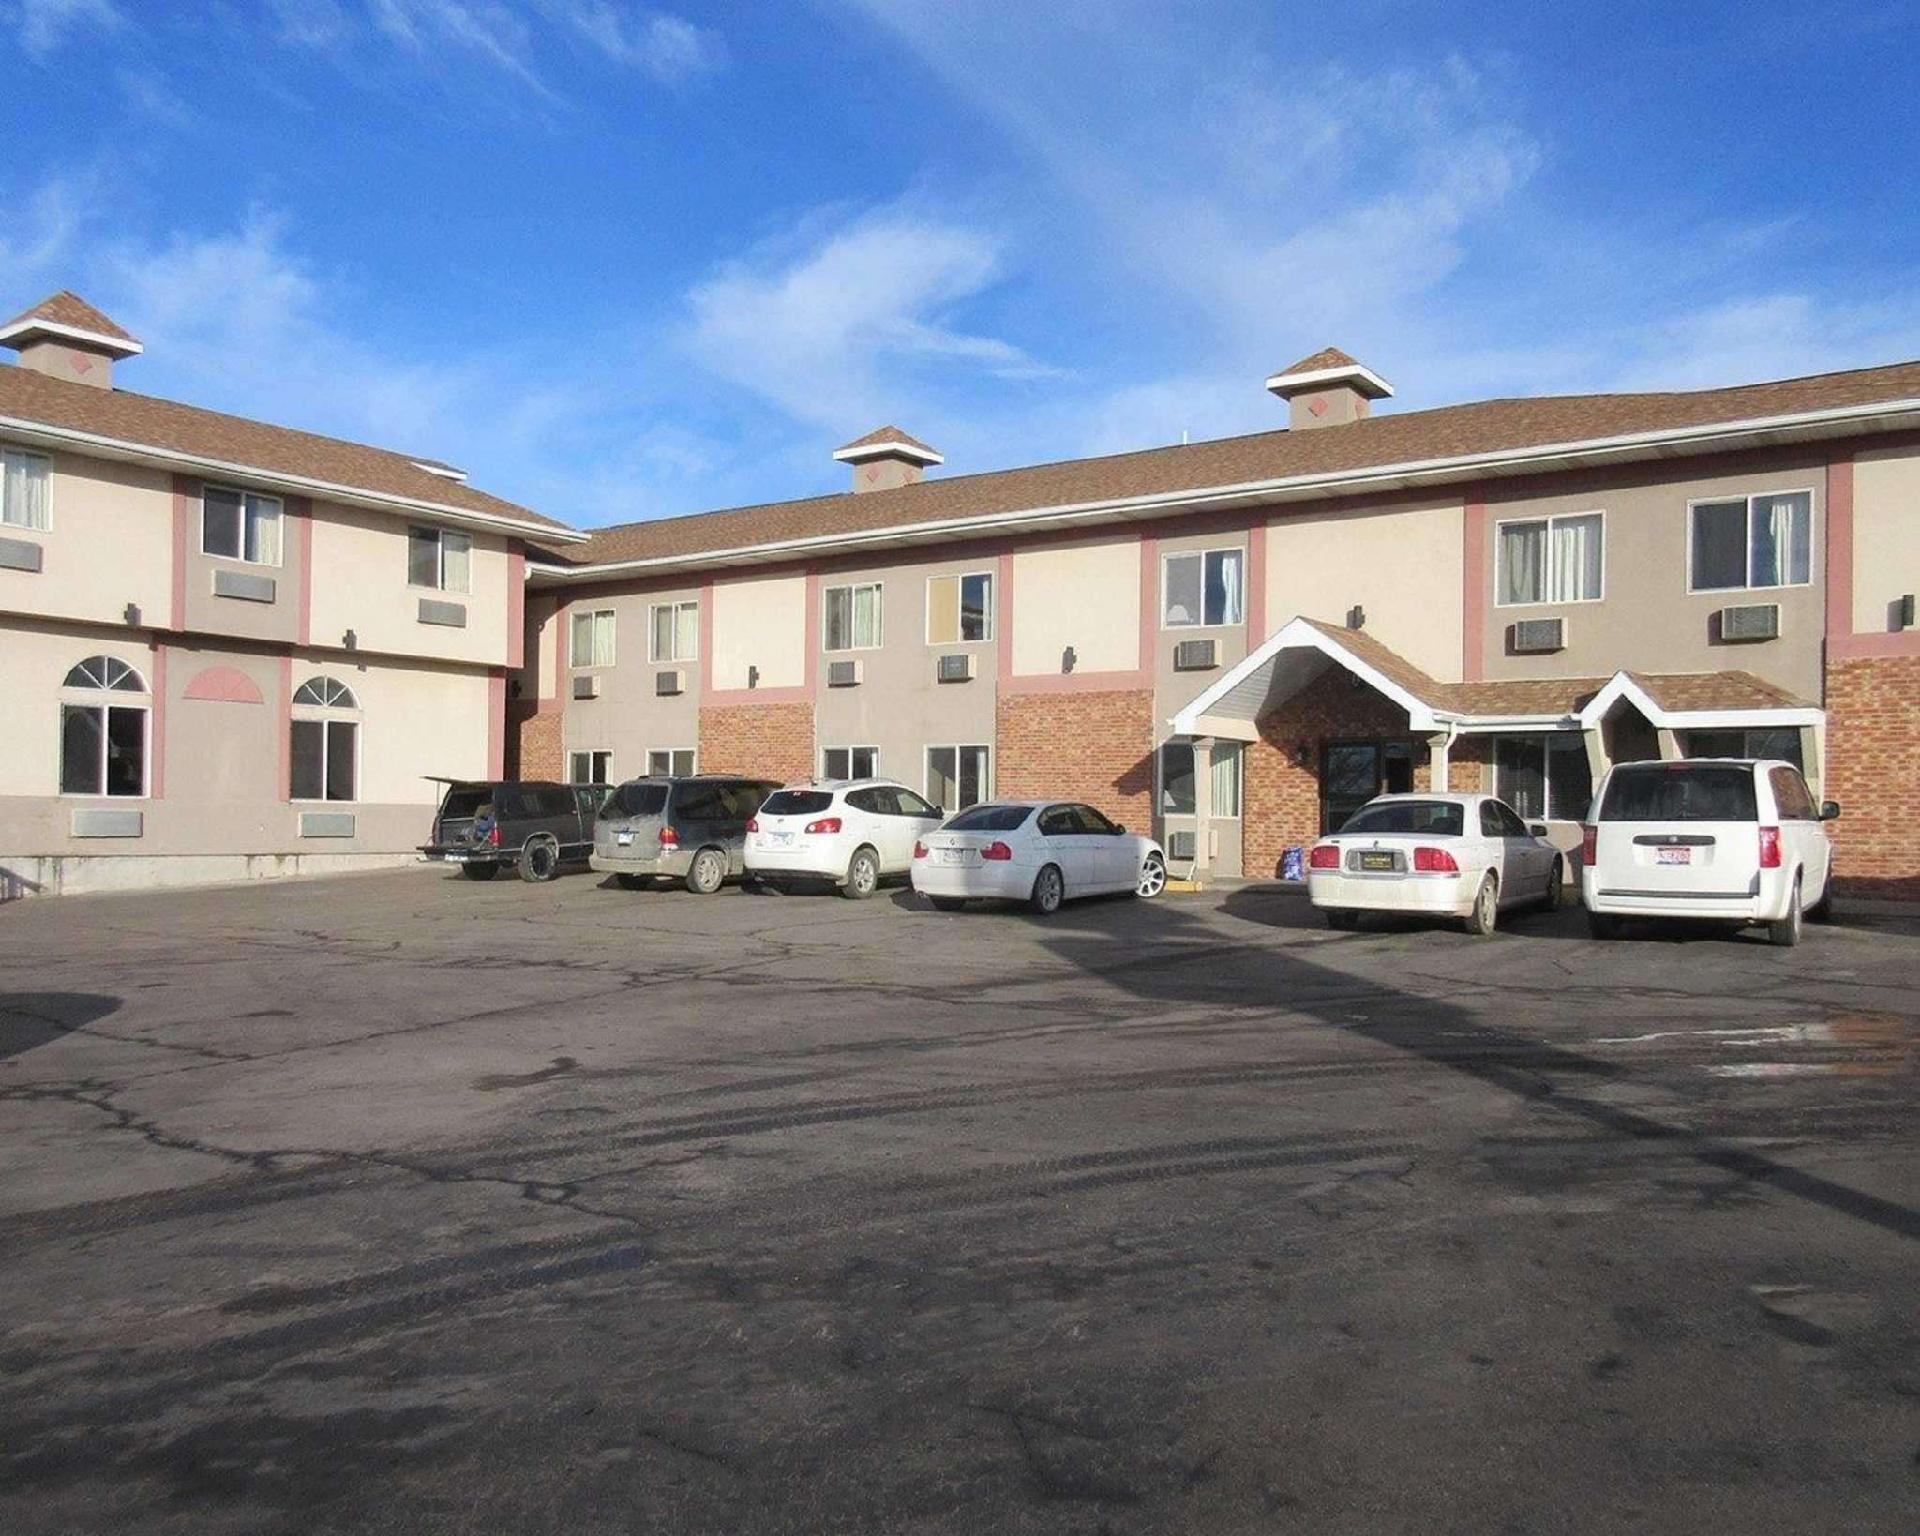 Rodeway Inn Rapid City, Pennington